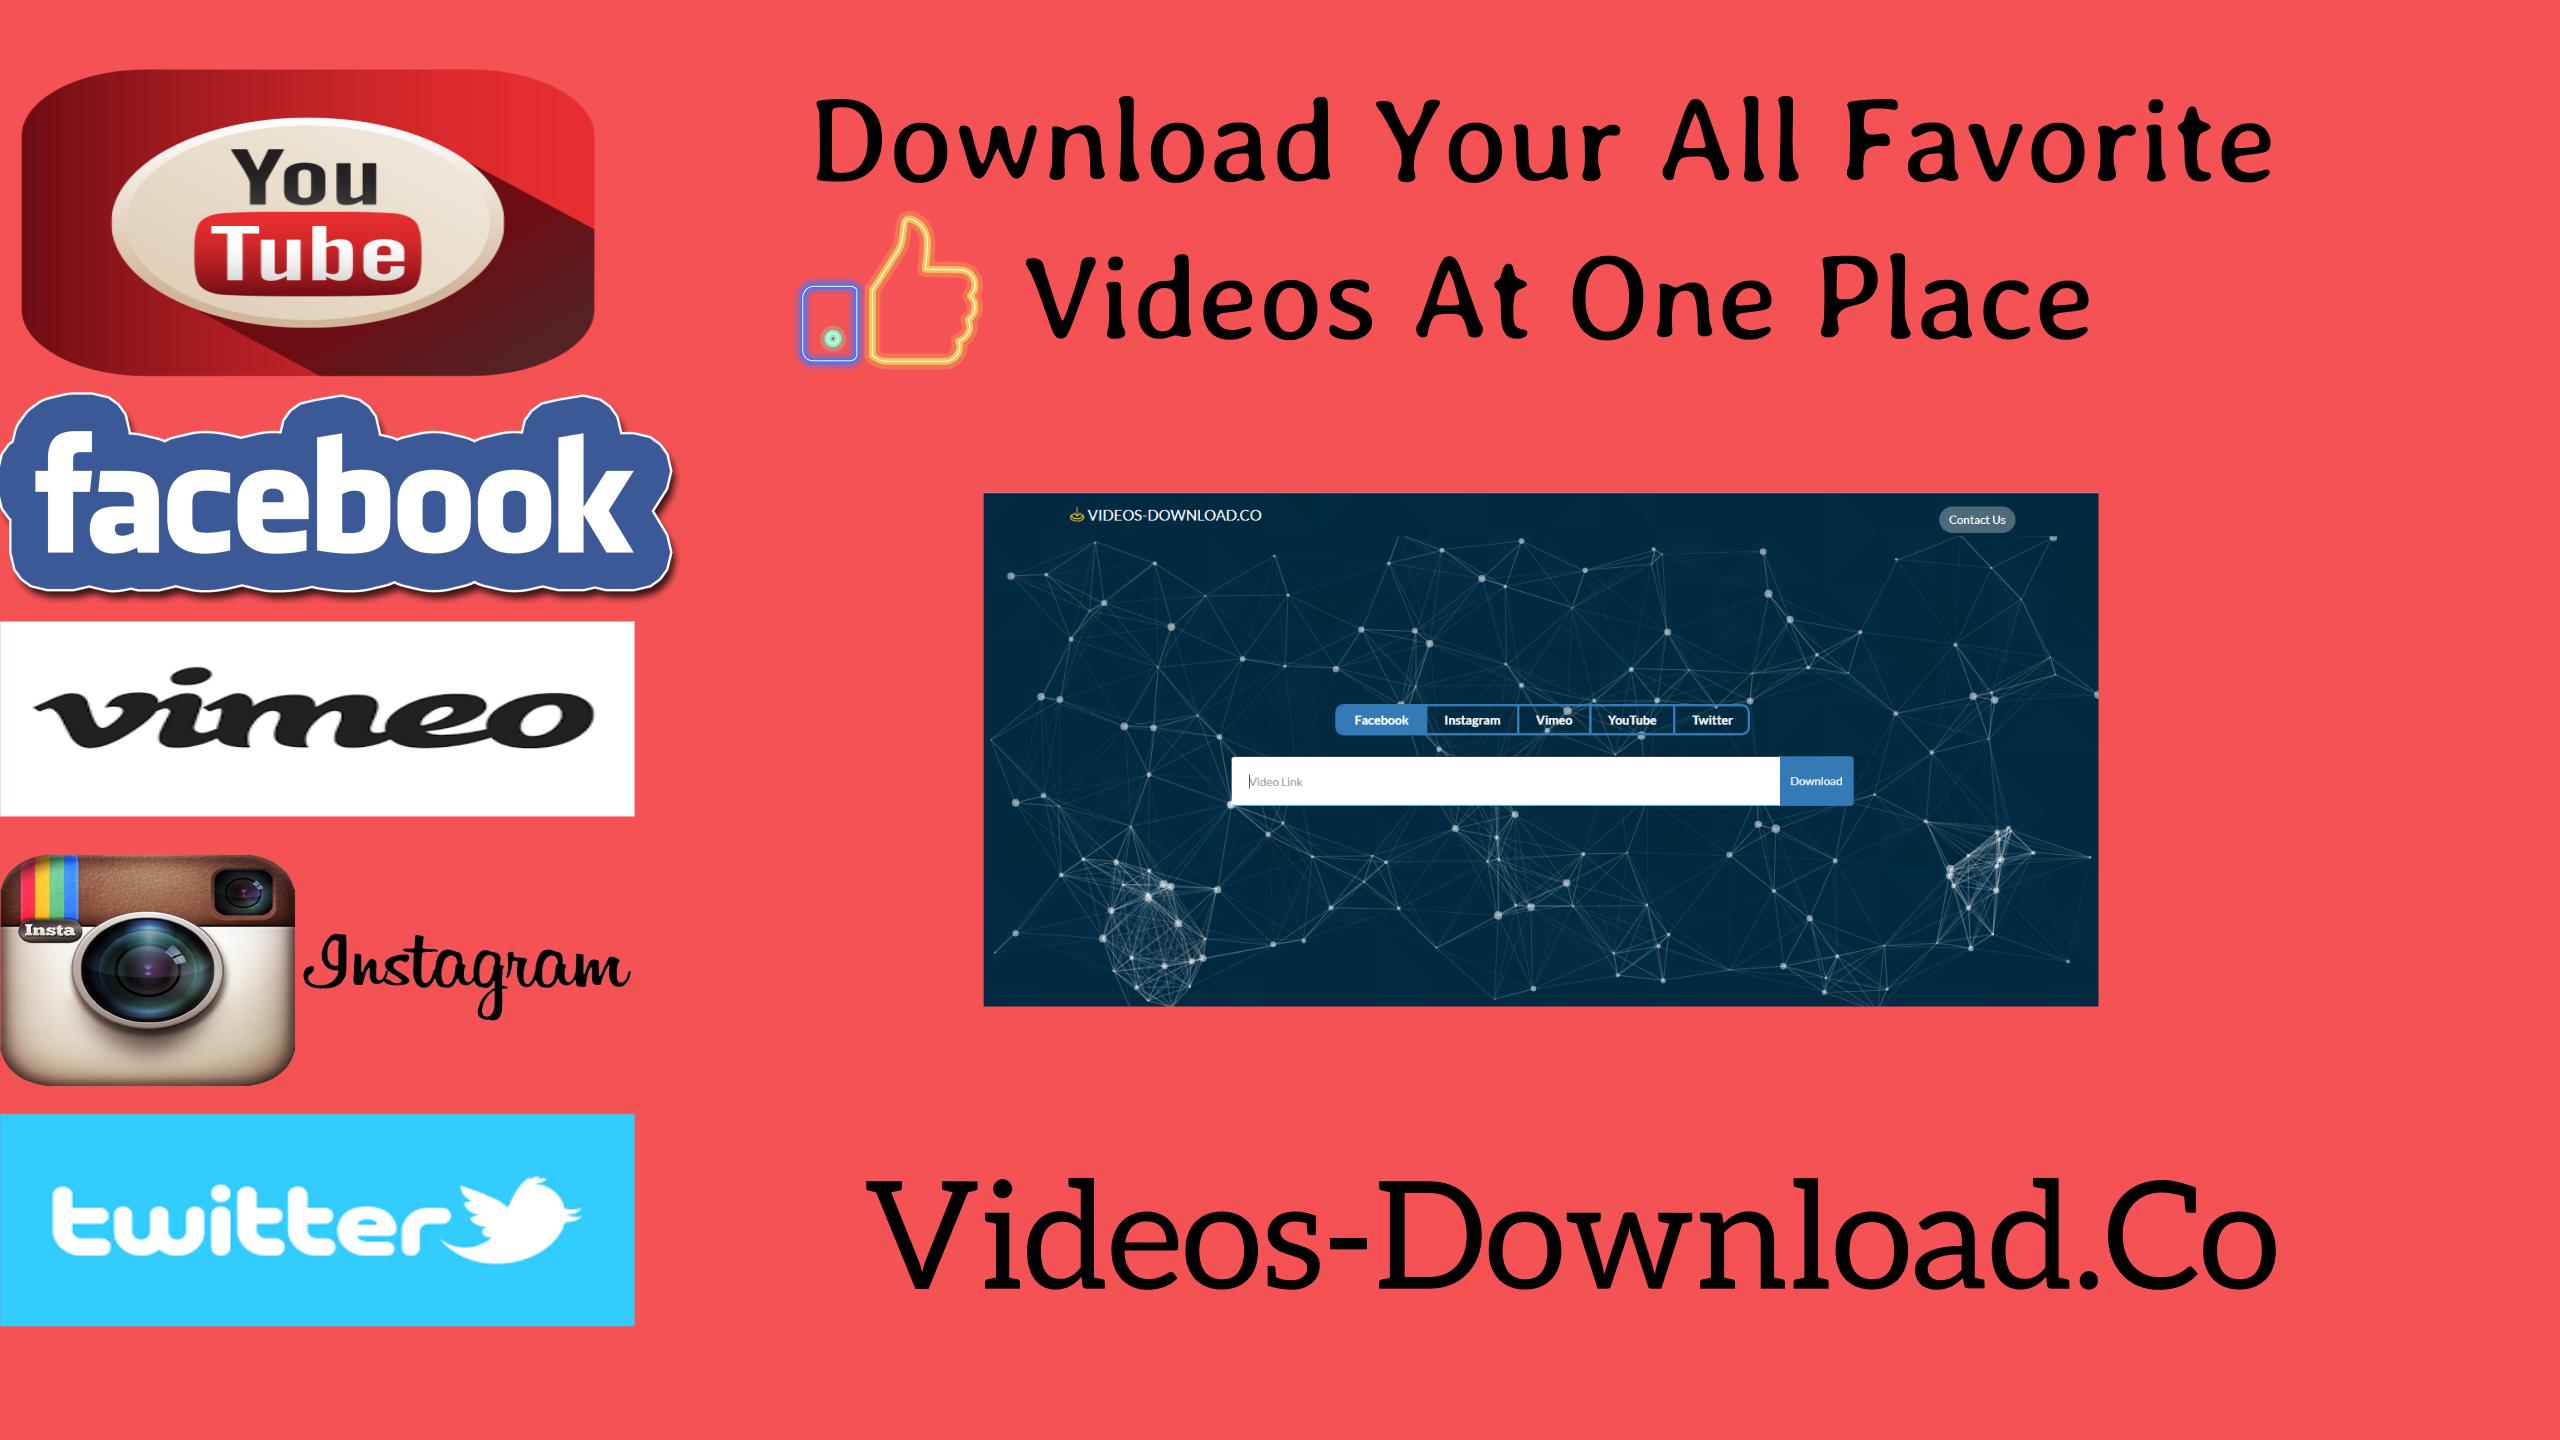 Now Download Facebook Videos Youtube Videos Instagram Videos Twitter Gifs And Videos Vimeo Videos All At At One Place Twitter Video Facebook Video Instagram Video